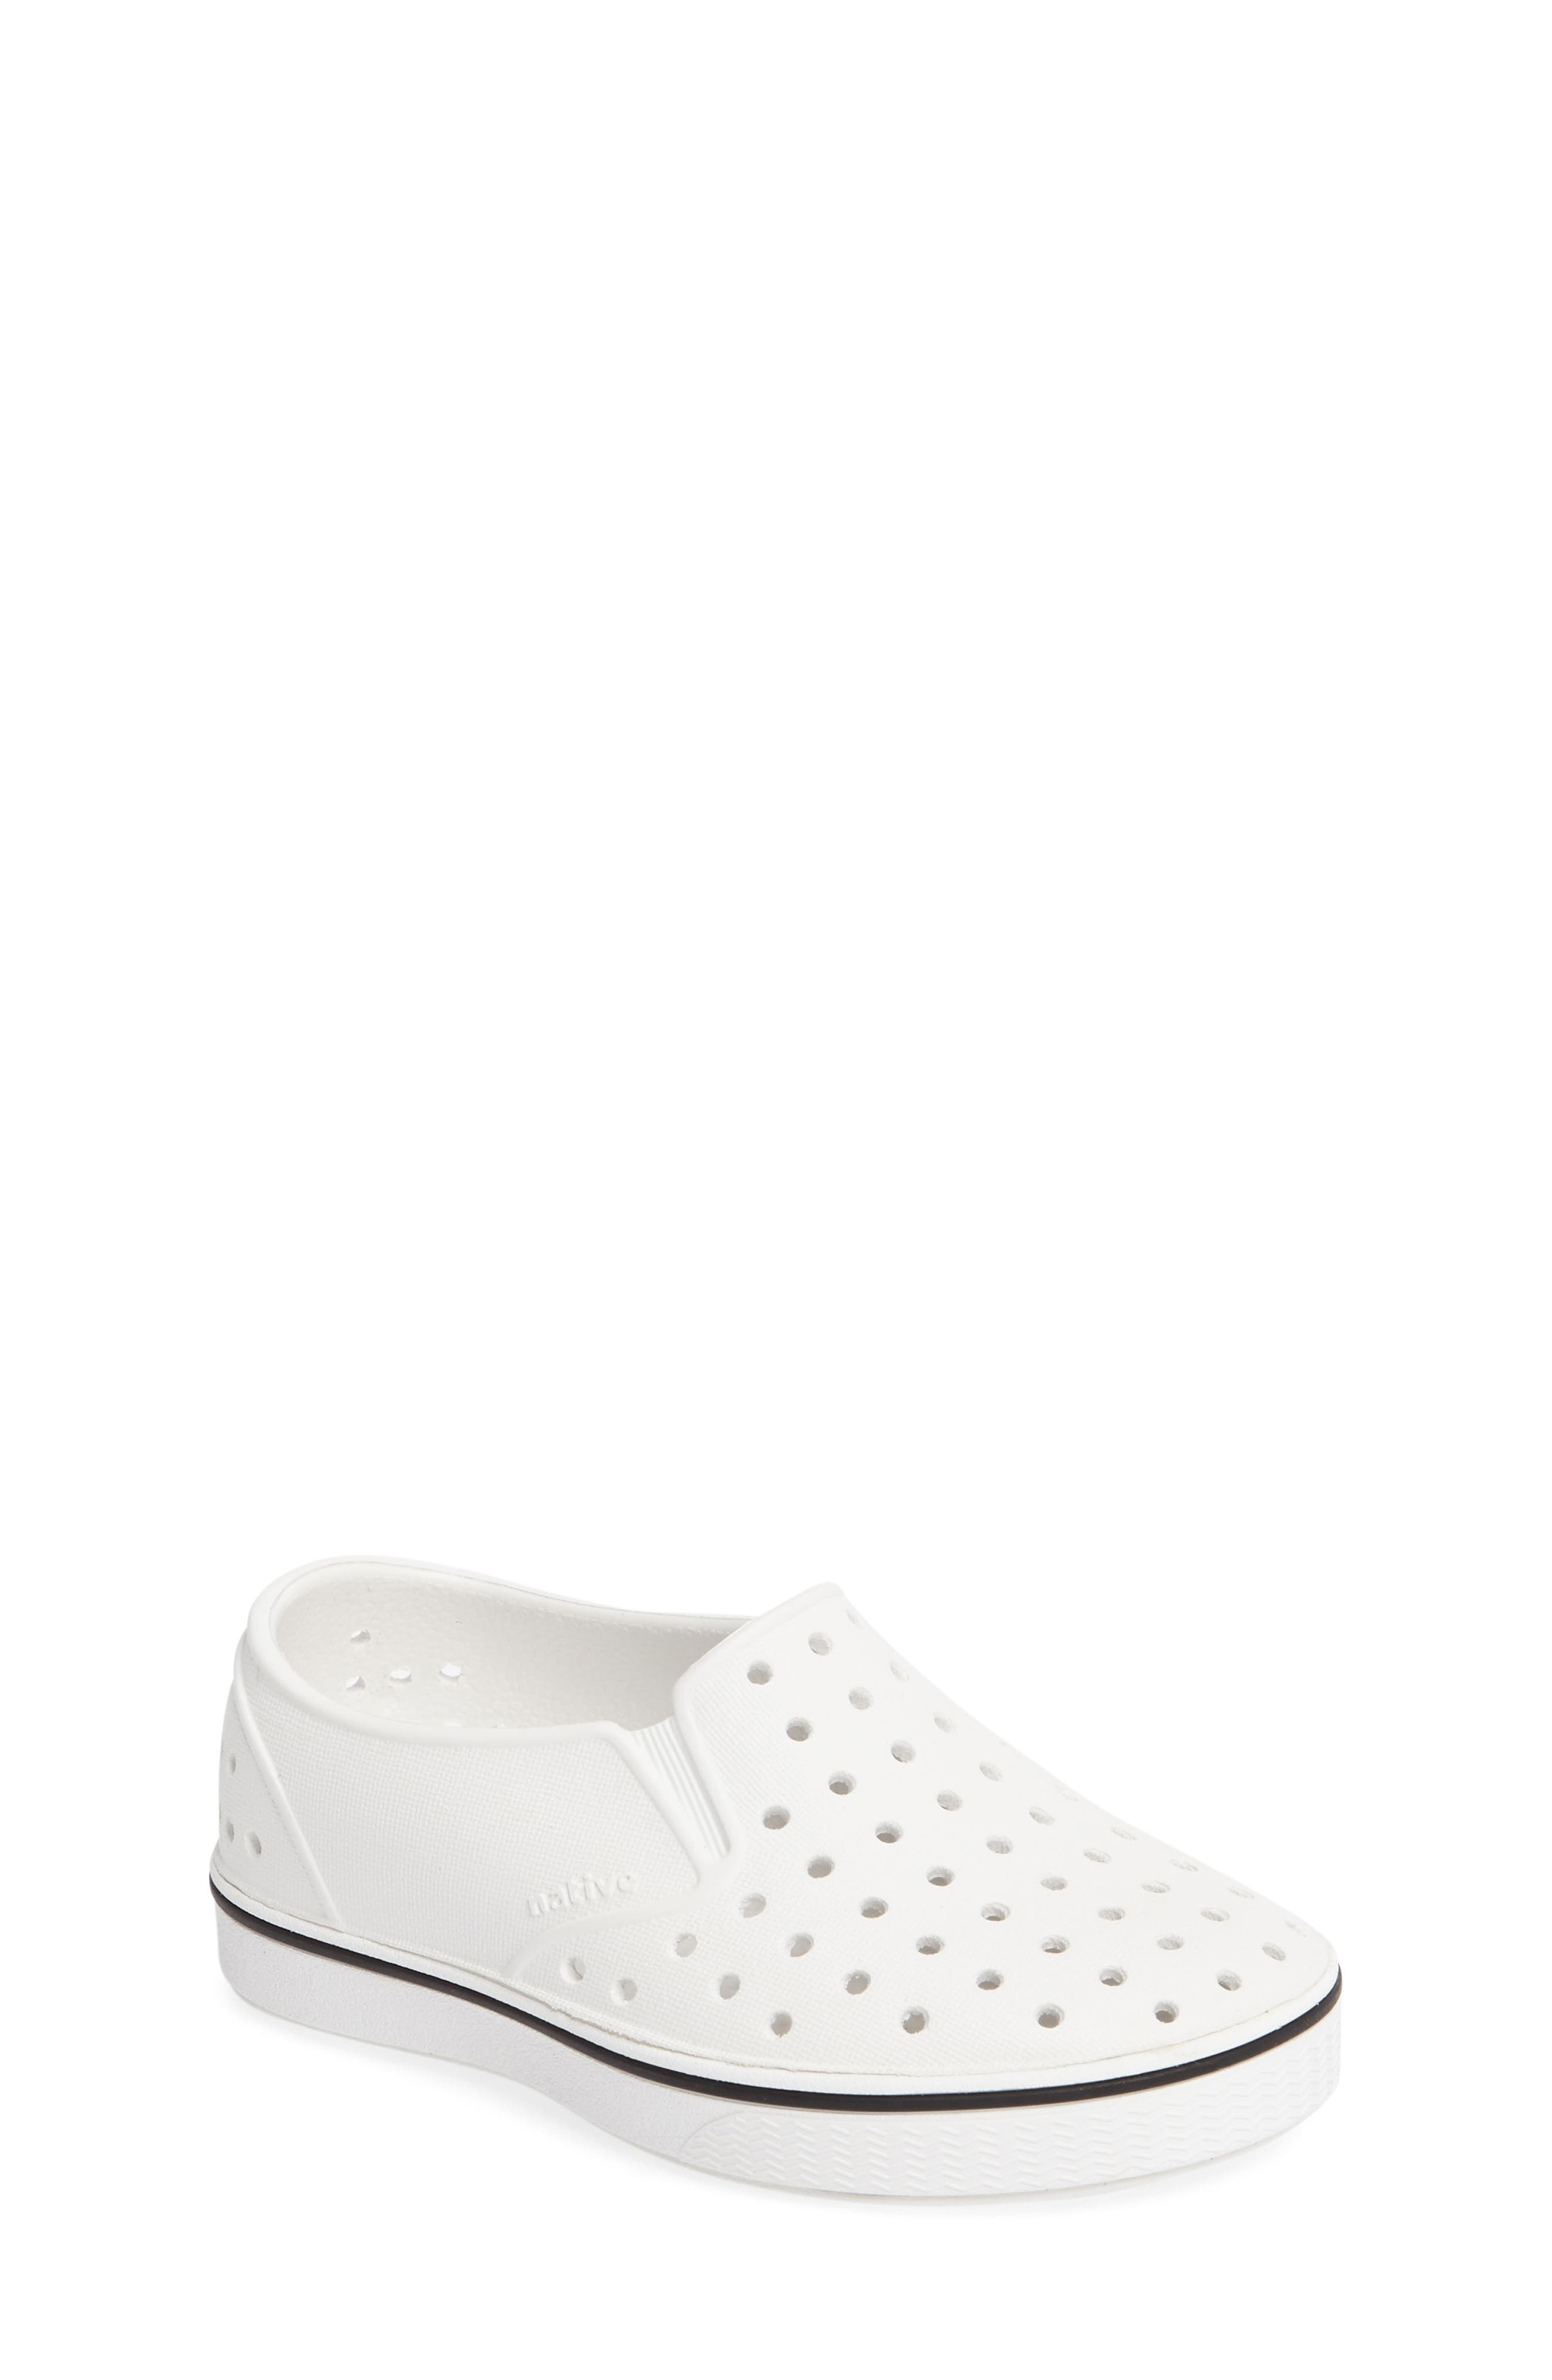 Native Shoes Miles Water Friendly Slip-On Vegan Sneaker